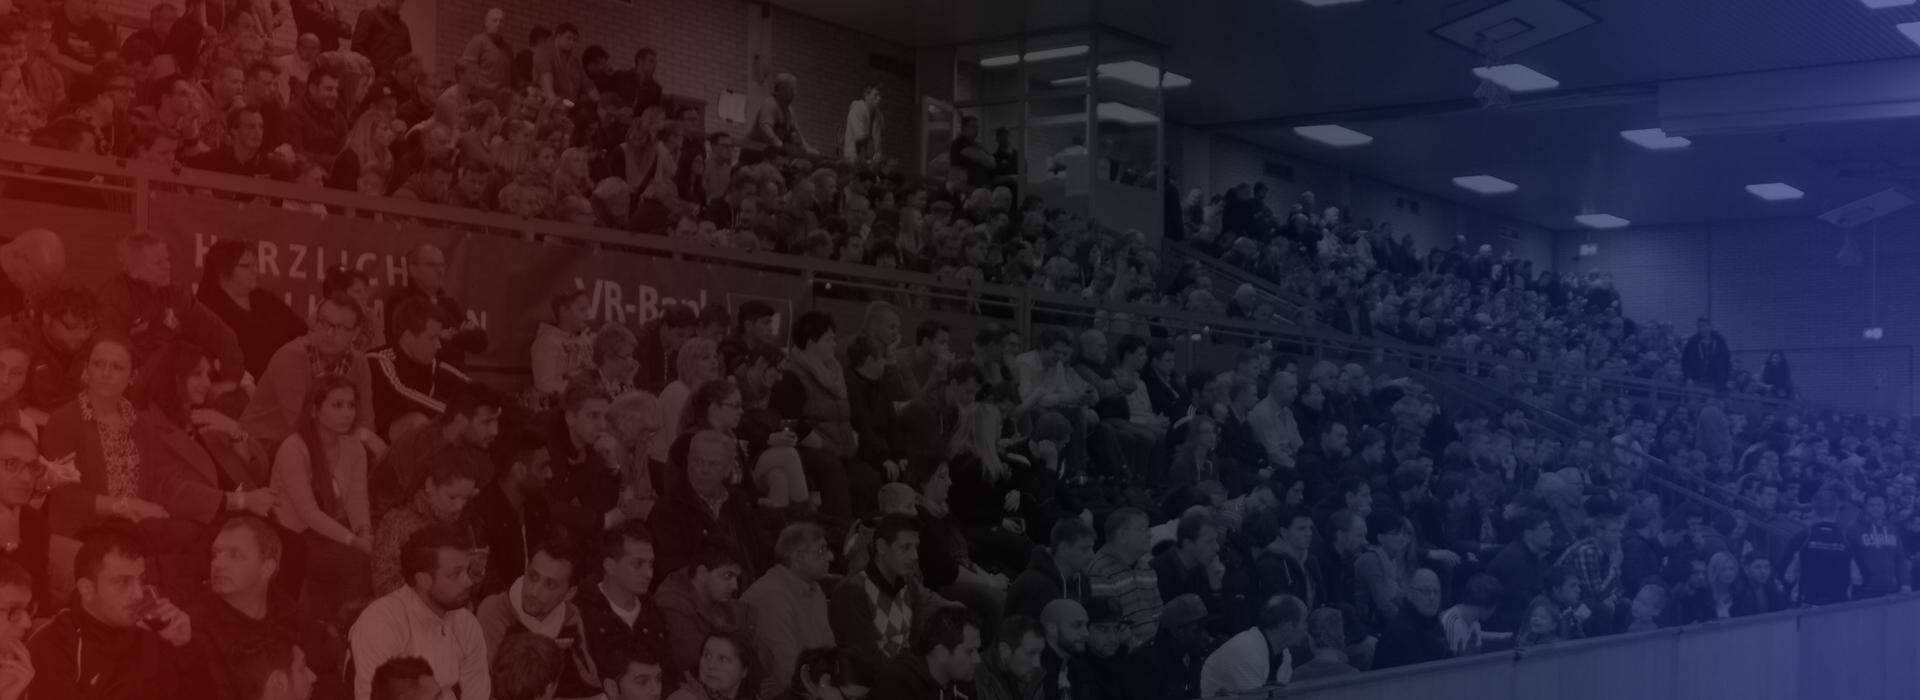 Senger Cup Titelbild Webseite